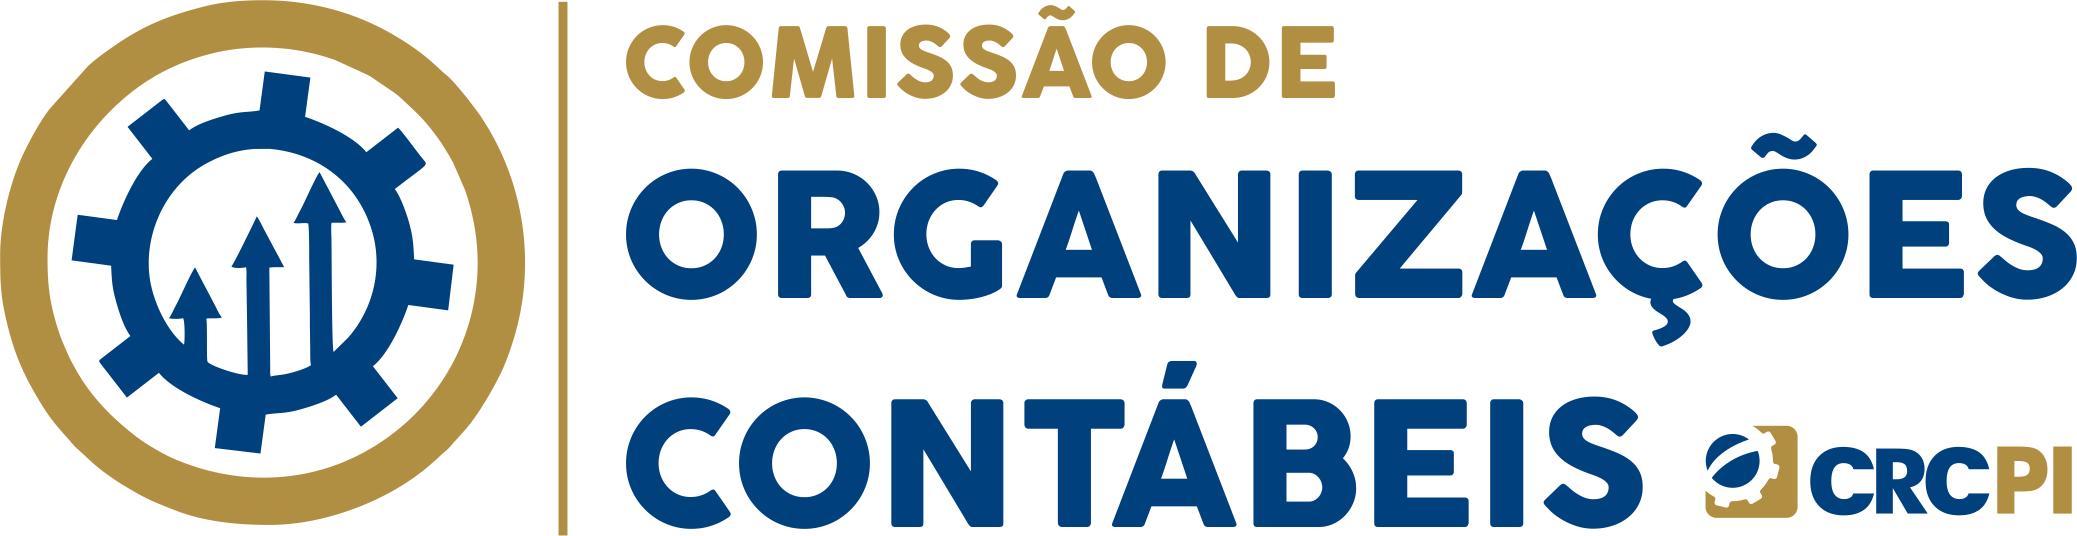 Comissao_Organizacoes Contabeis